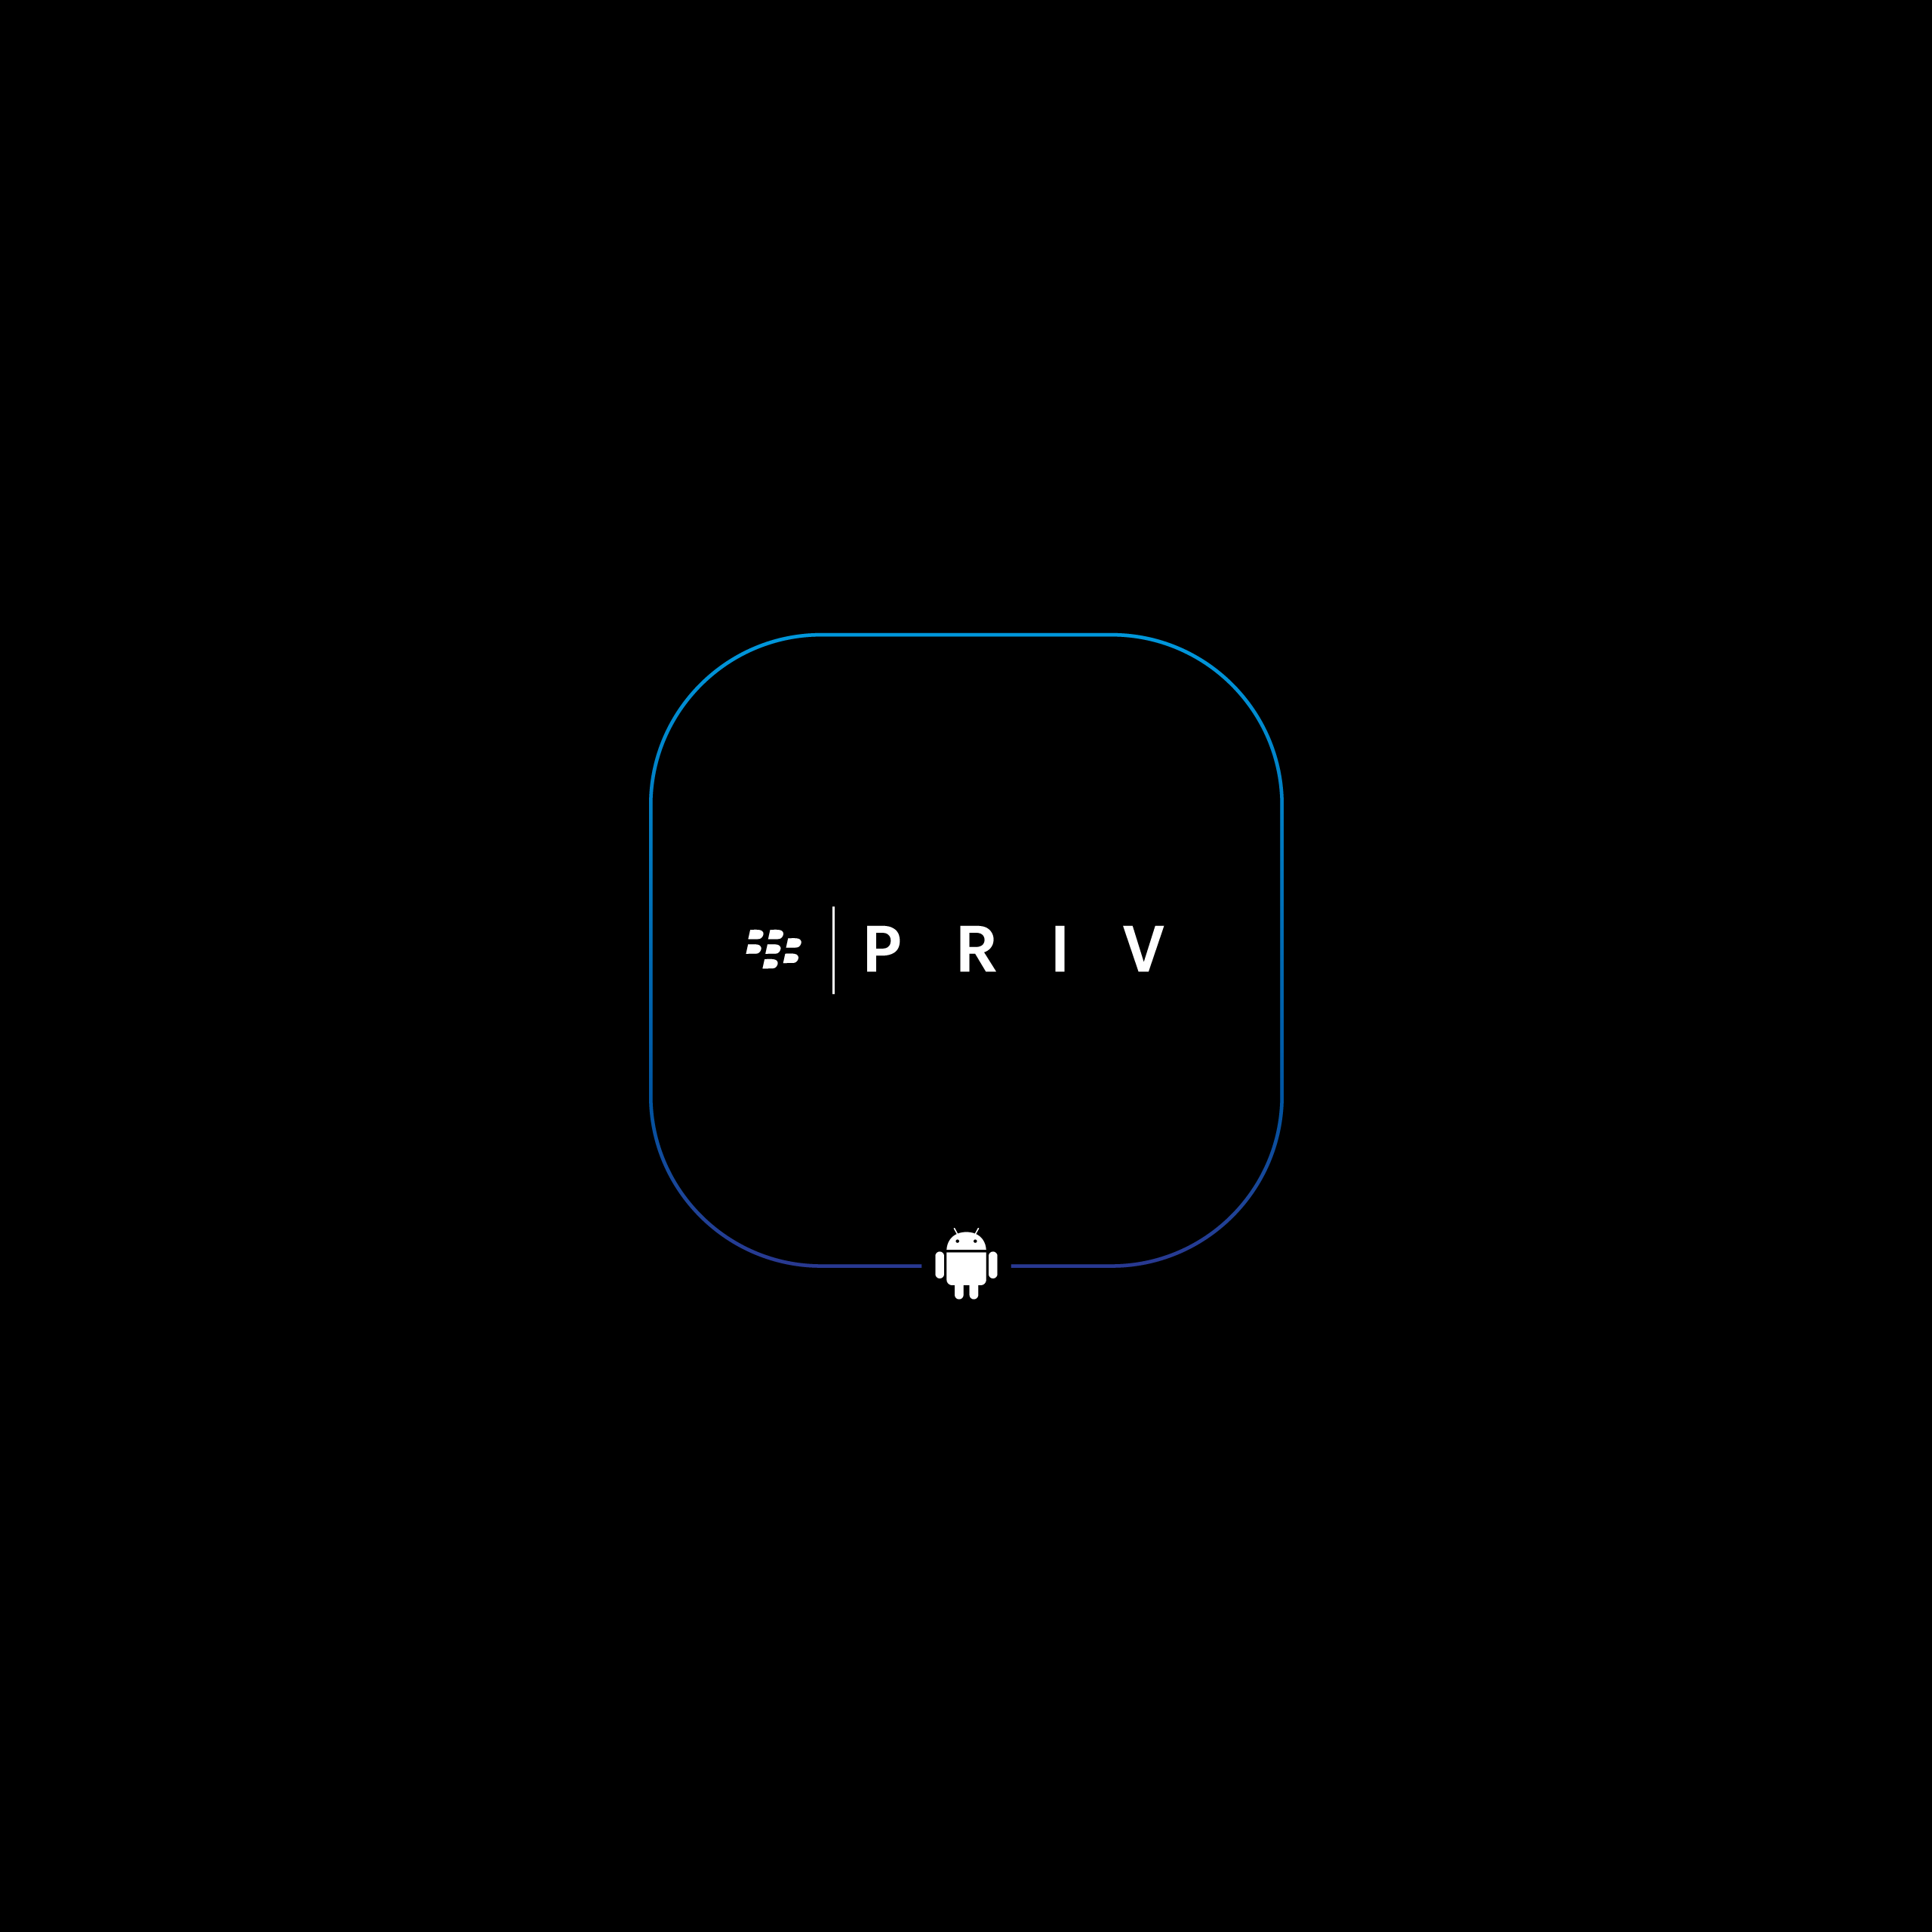 Privsquircle_2560X2560 - Blackberry Priv, Transparent background PNG HD thumbnail